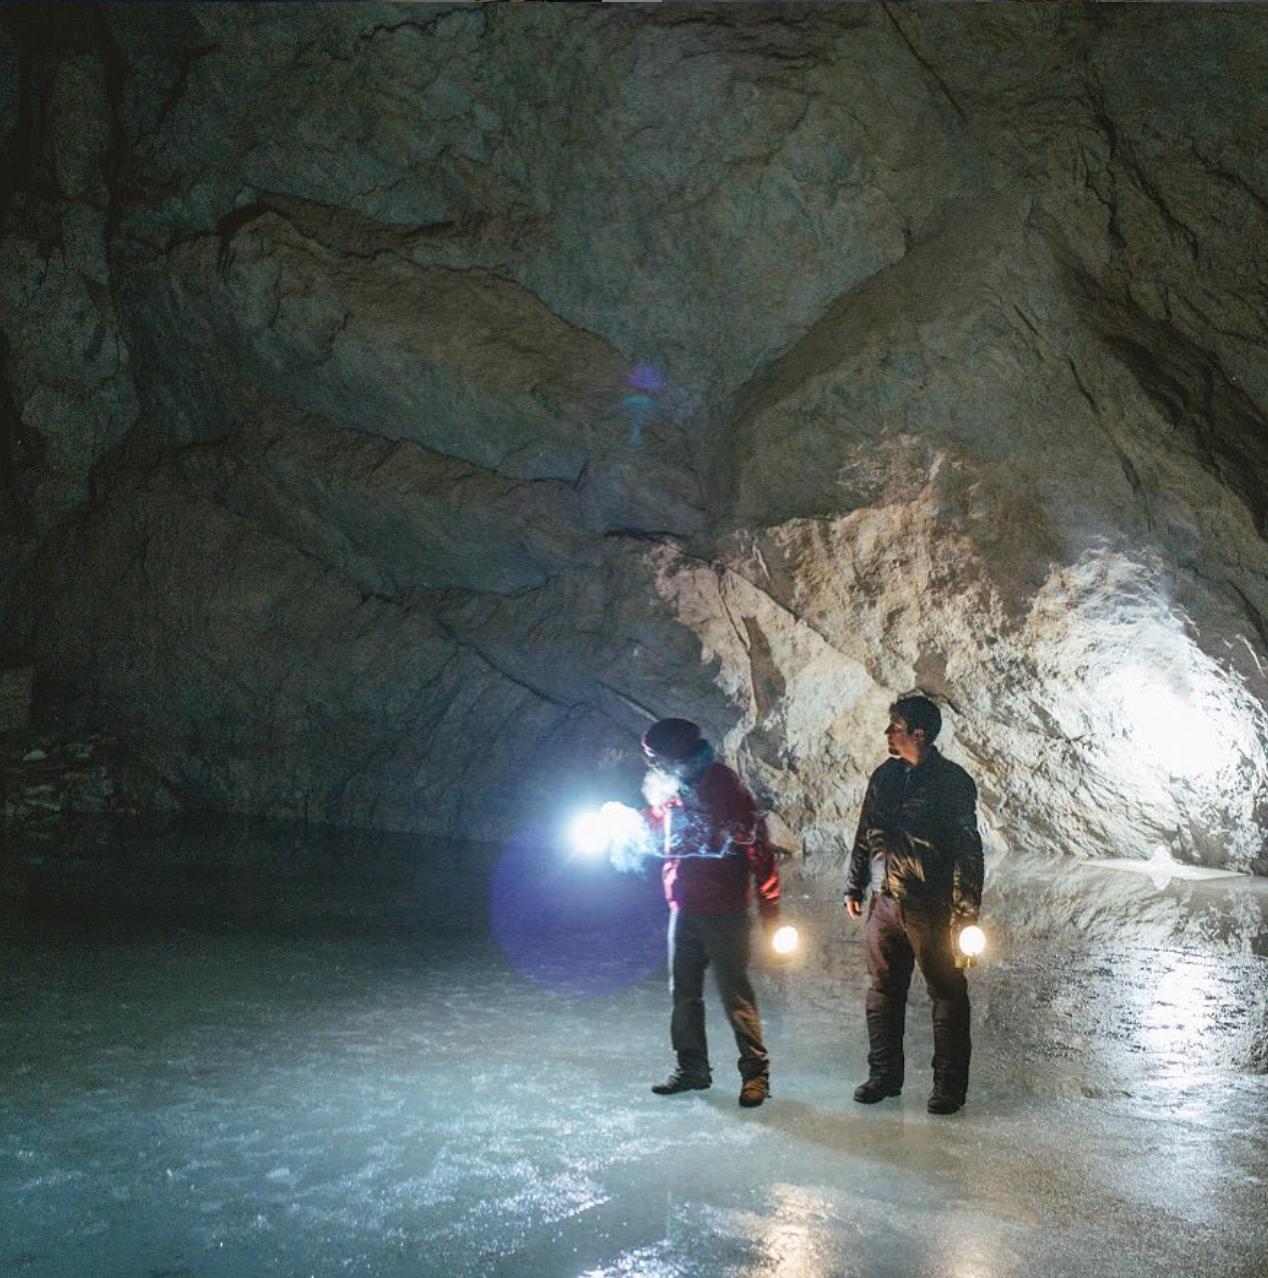 Luis Castilla - ice caves copia.png